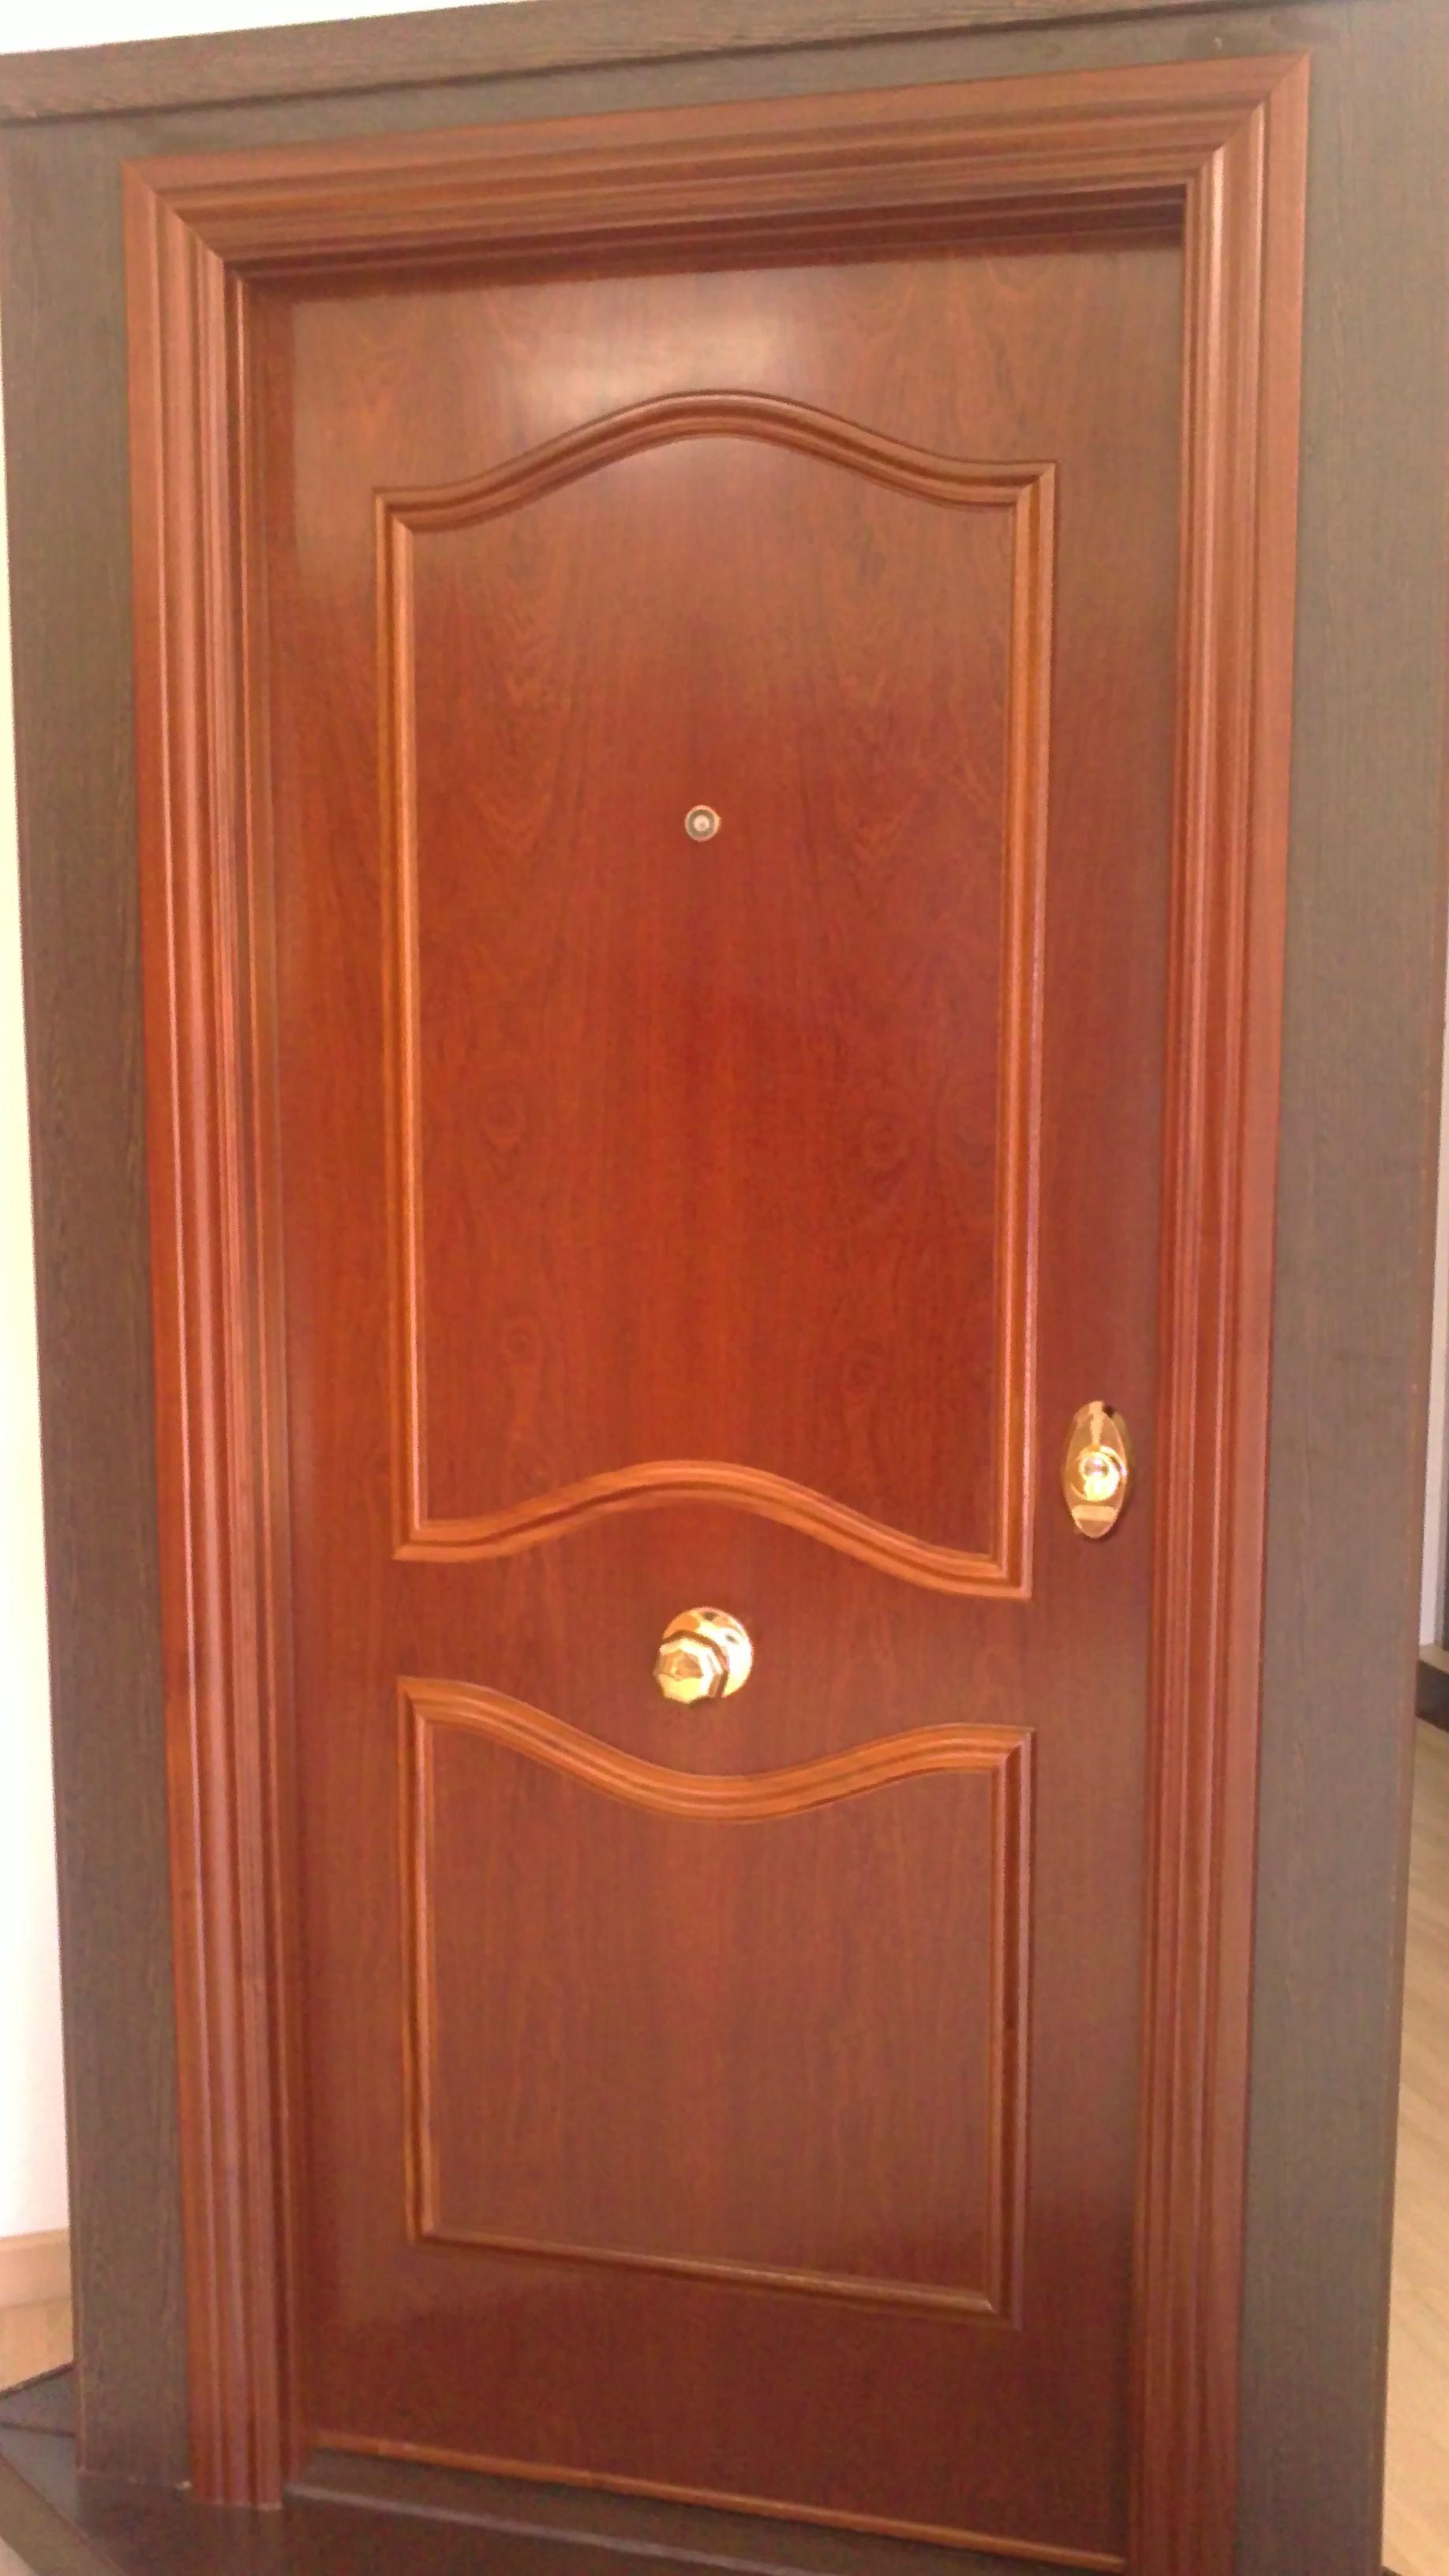 Puerta acorazada 3b sp100 sapelly rameado puertas for Puertas sapelly